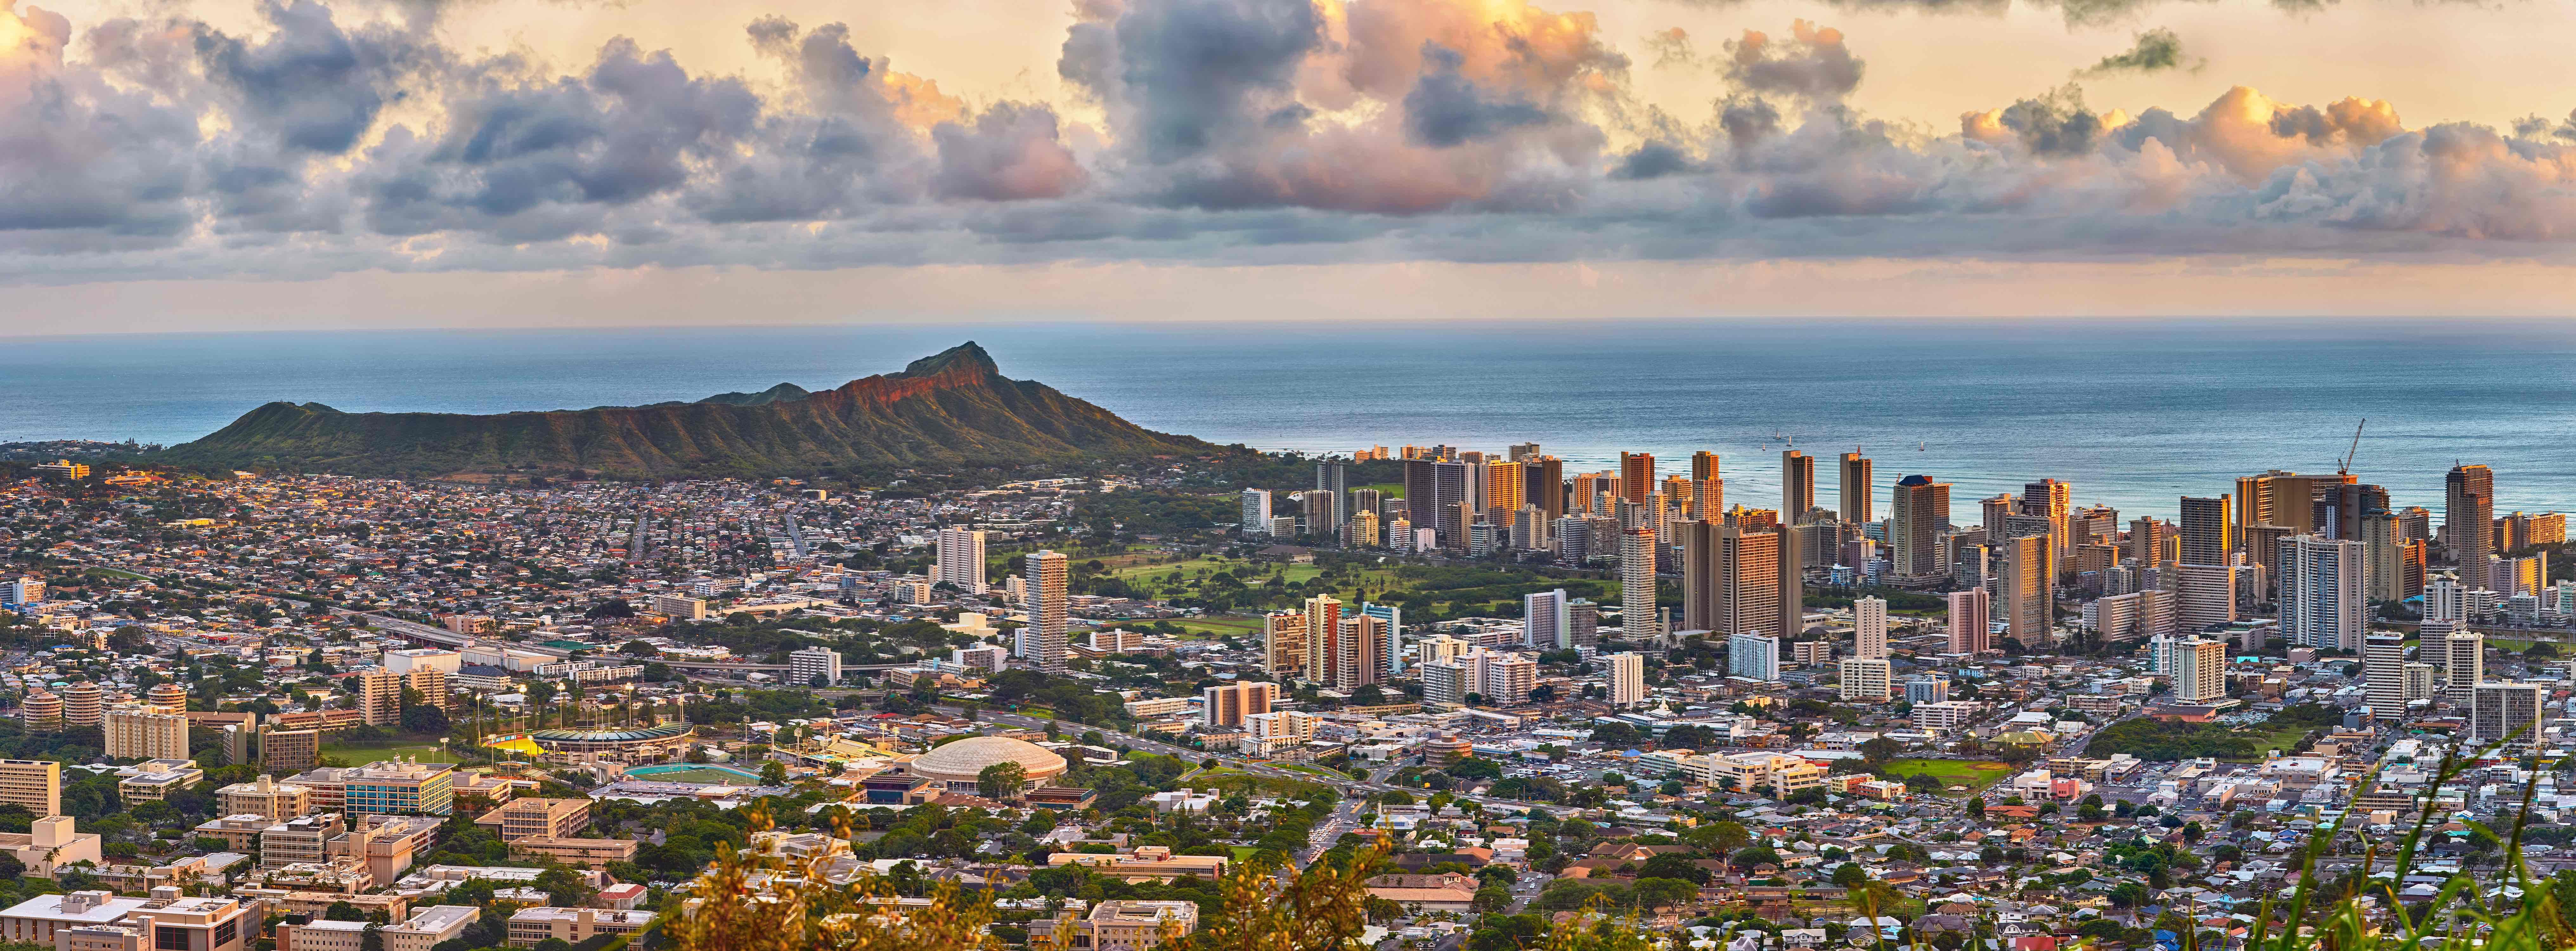 Waikiki and Diamond Head from Tantalus lookout